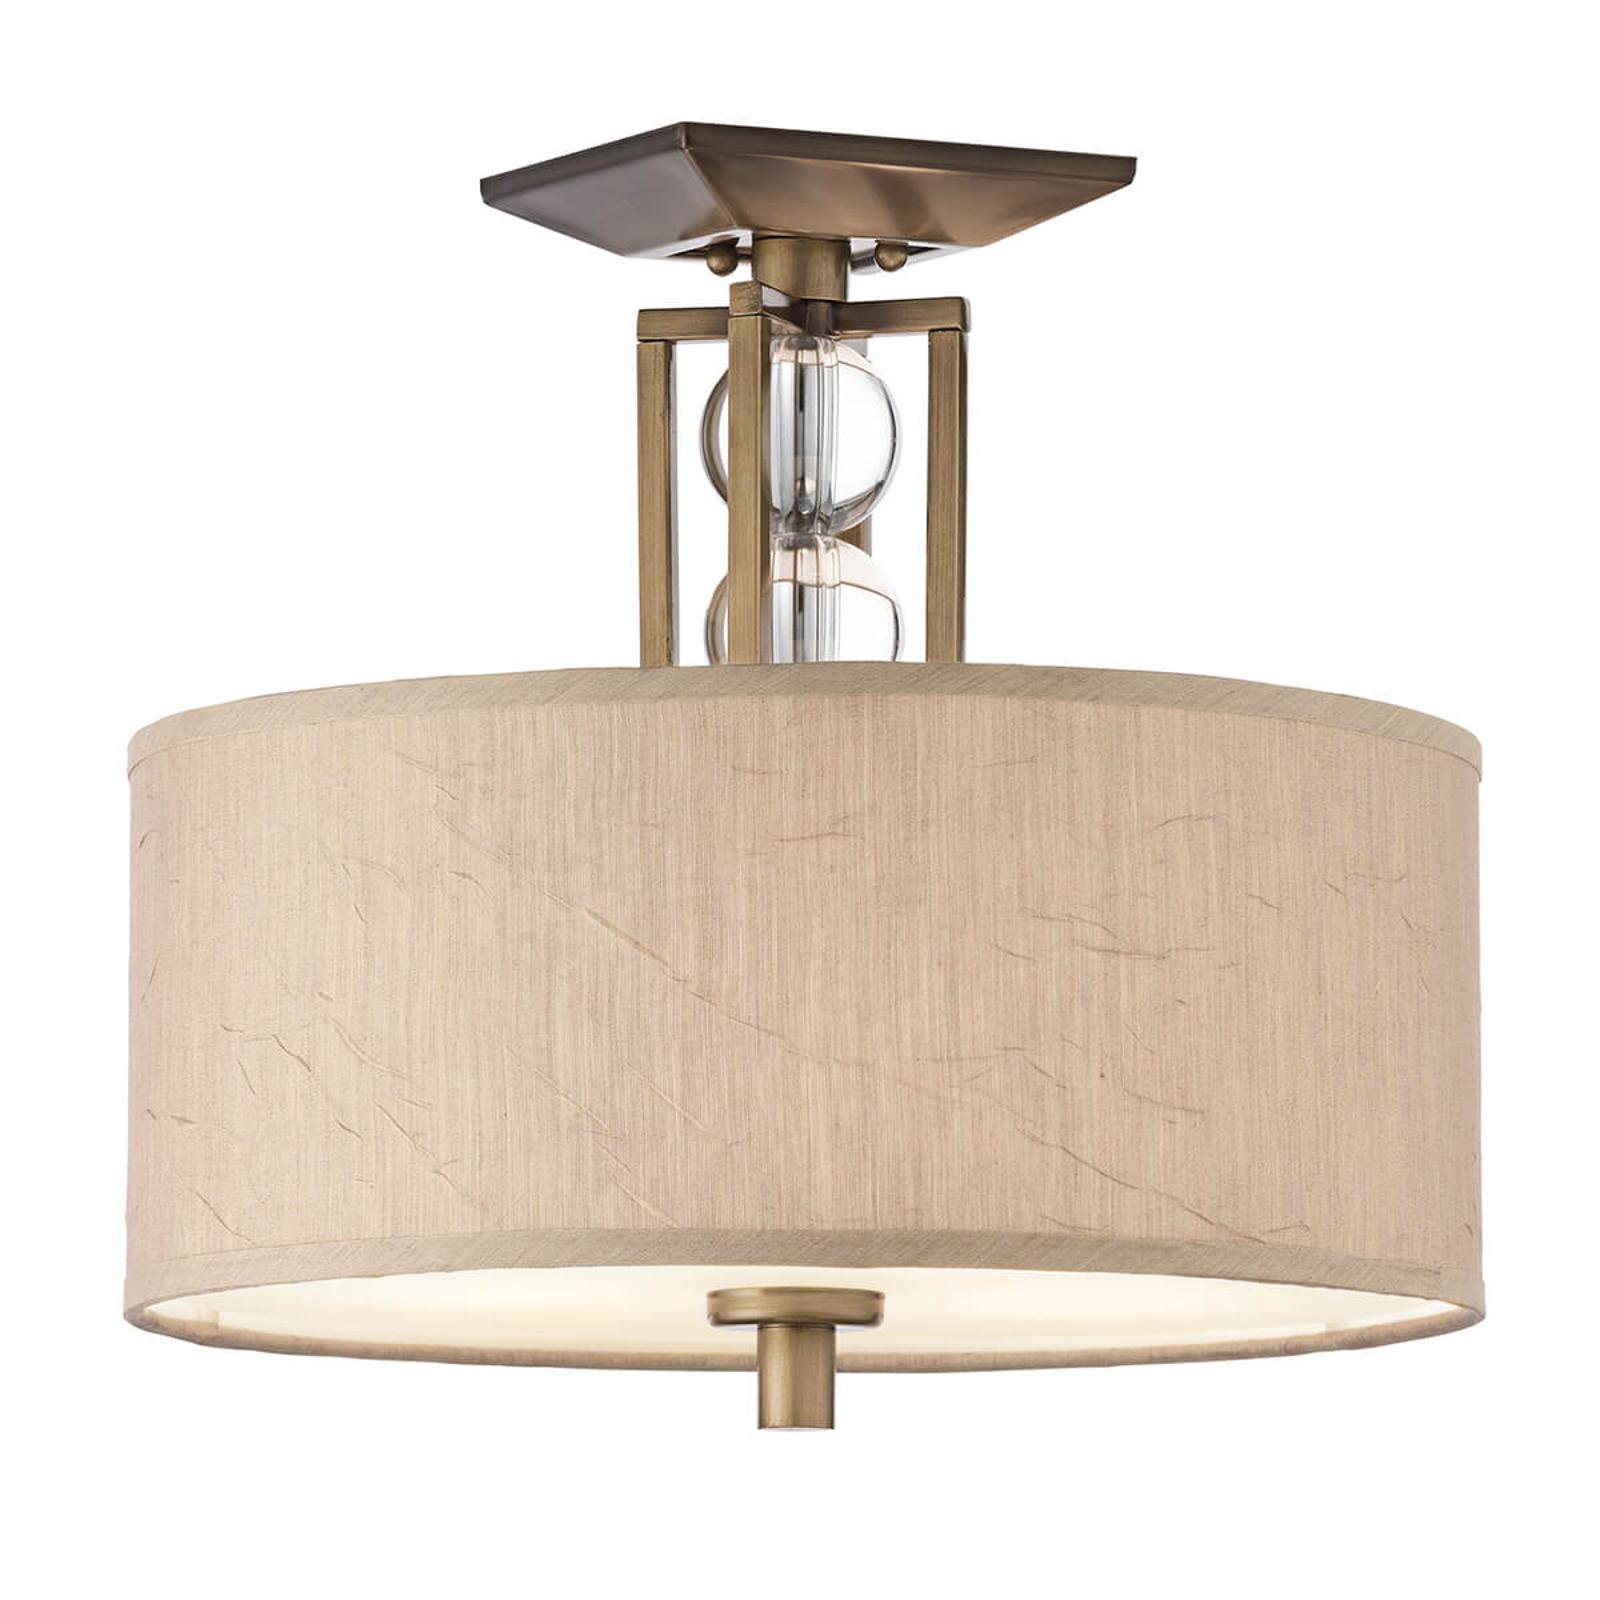 Plafondlamp Celestial met textiel lampenkap